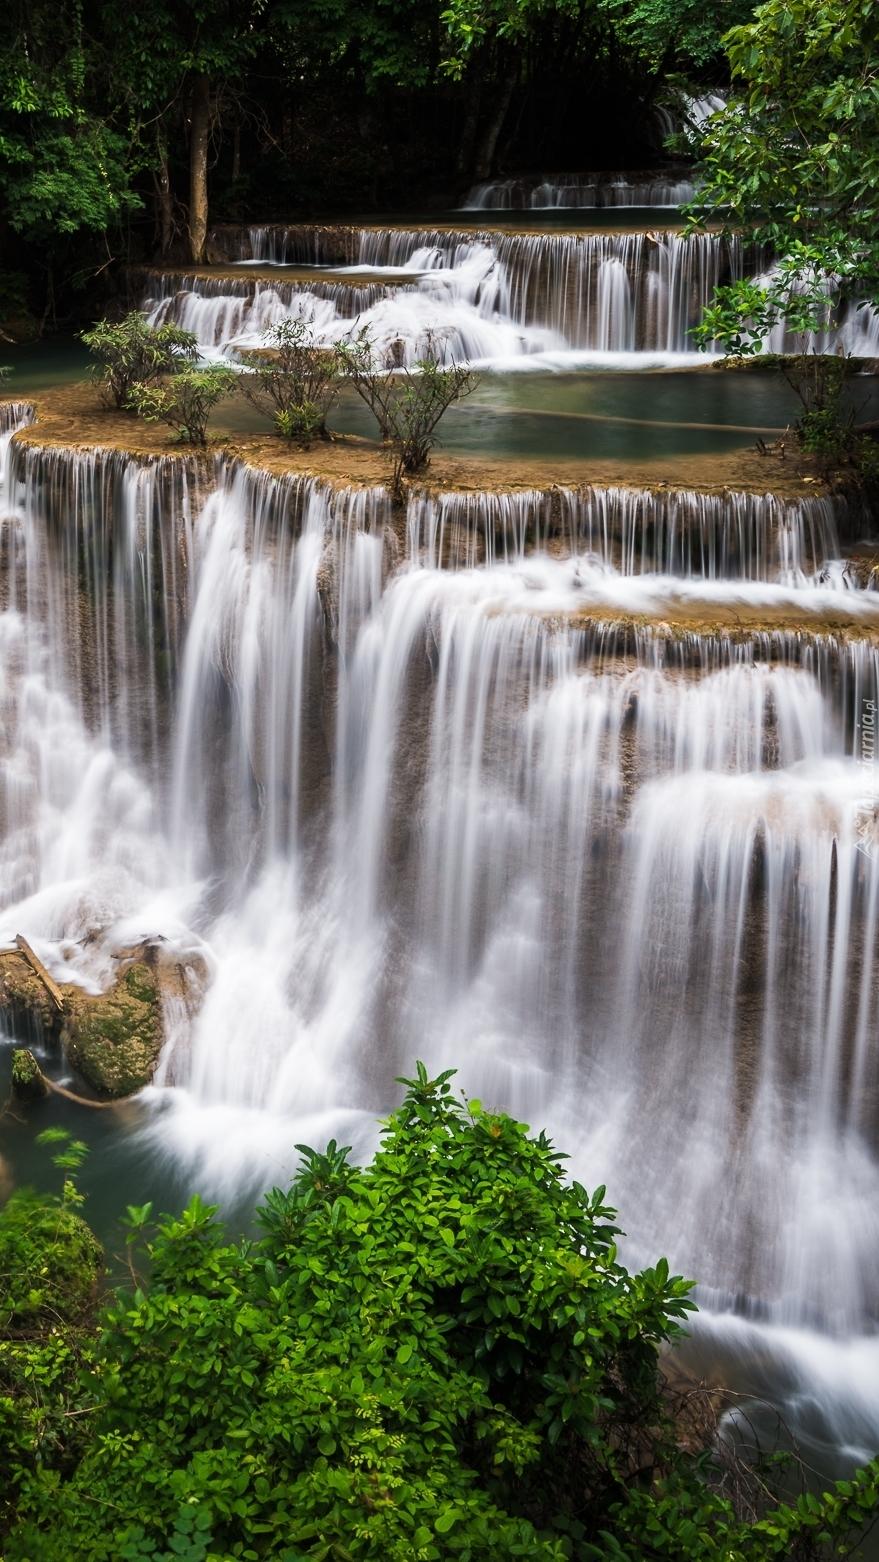 Wodospad Erawan waterfall